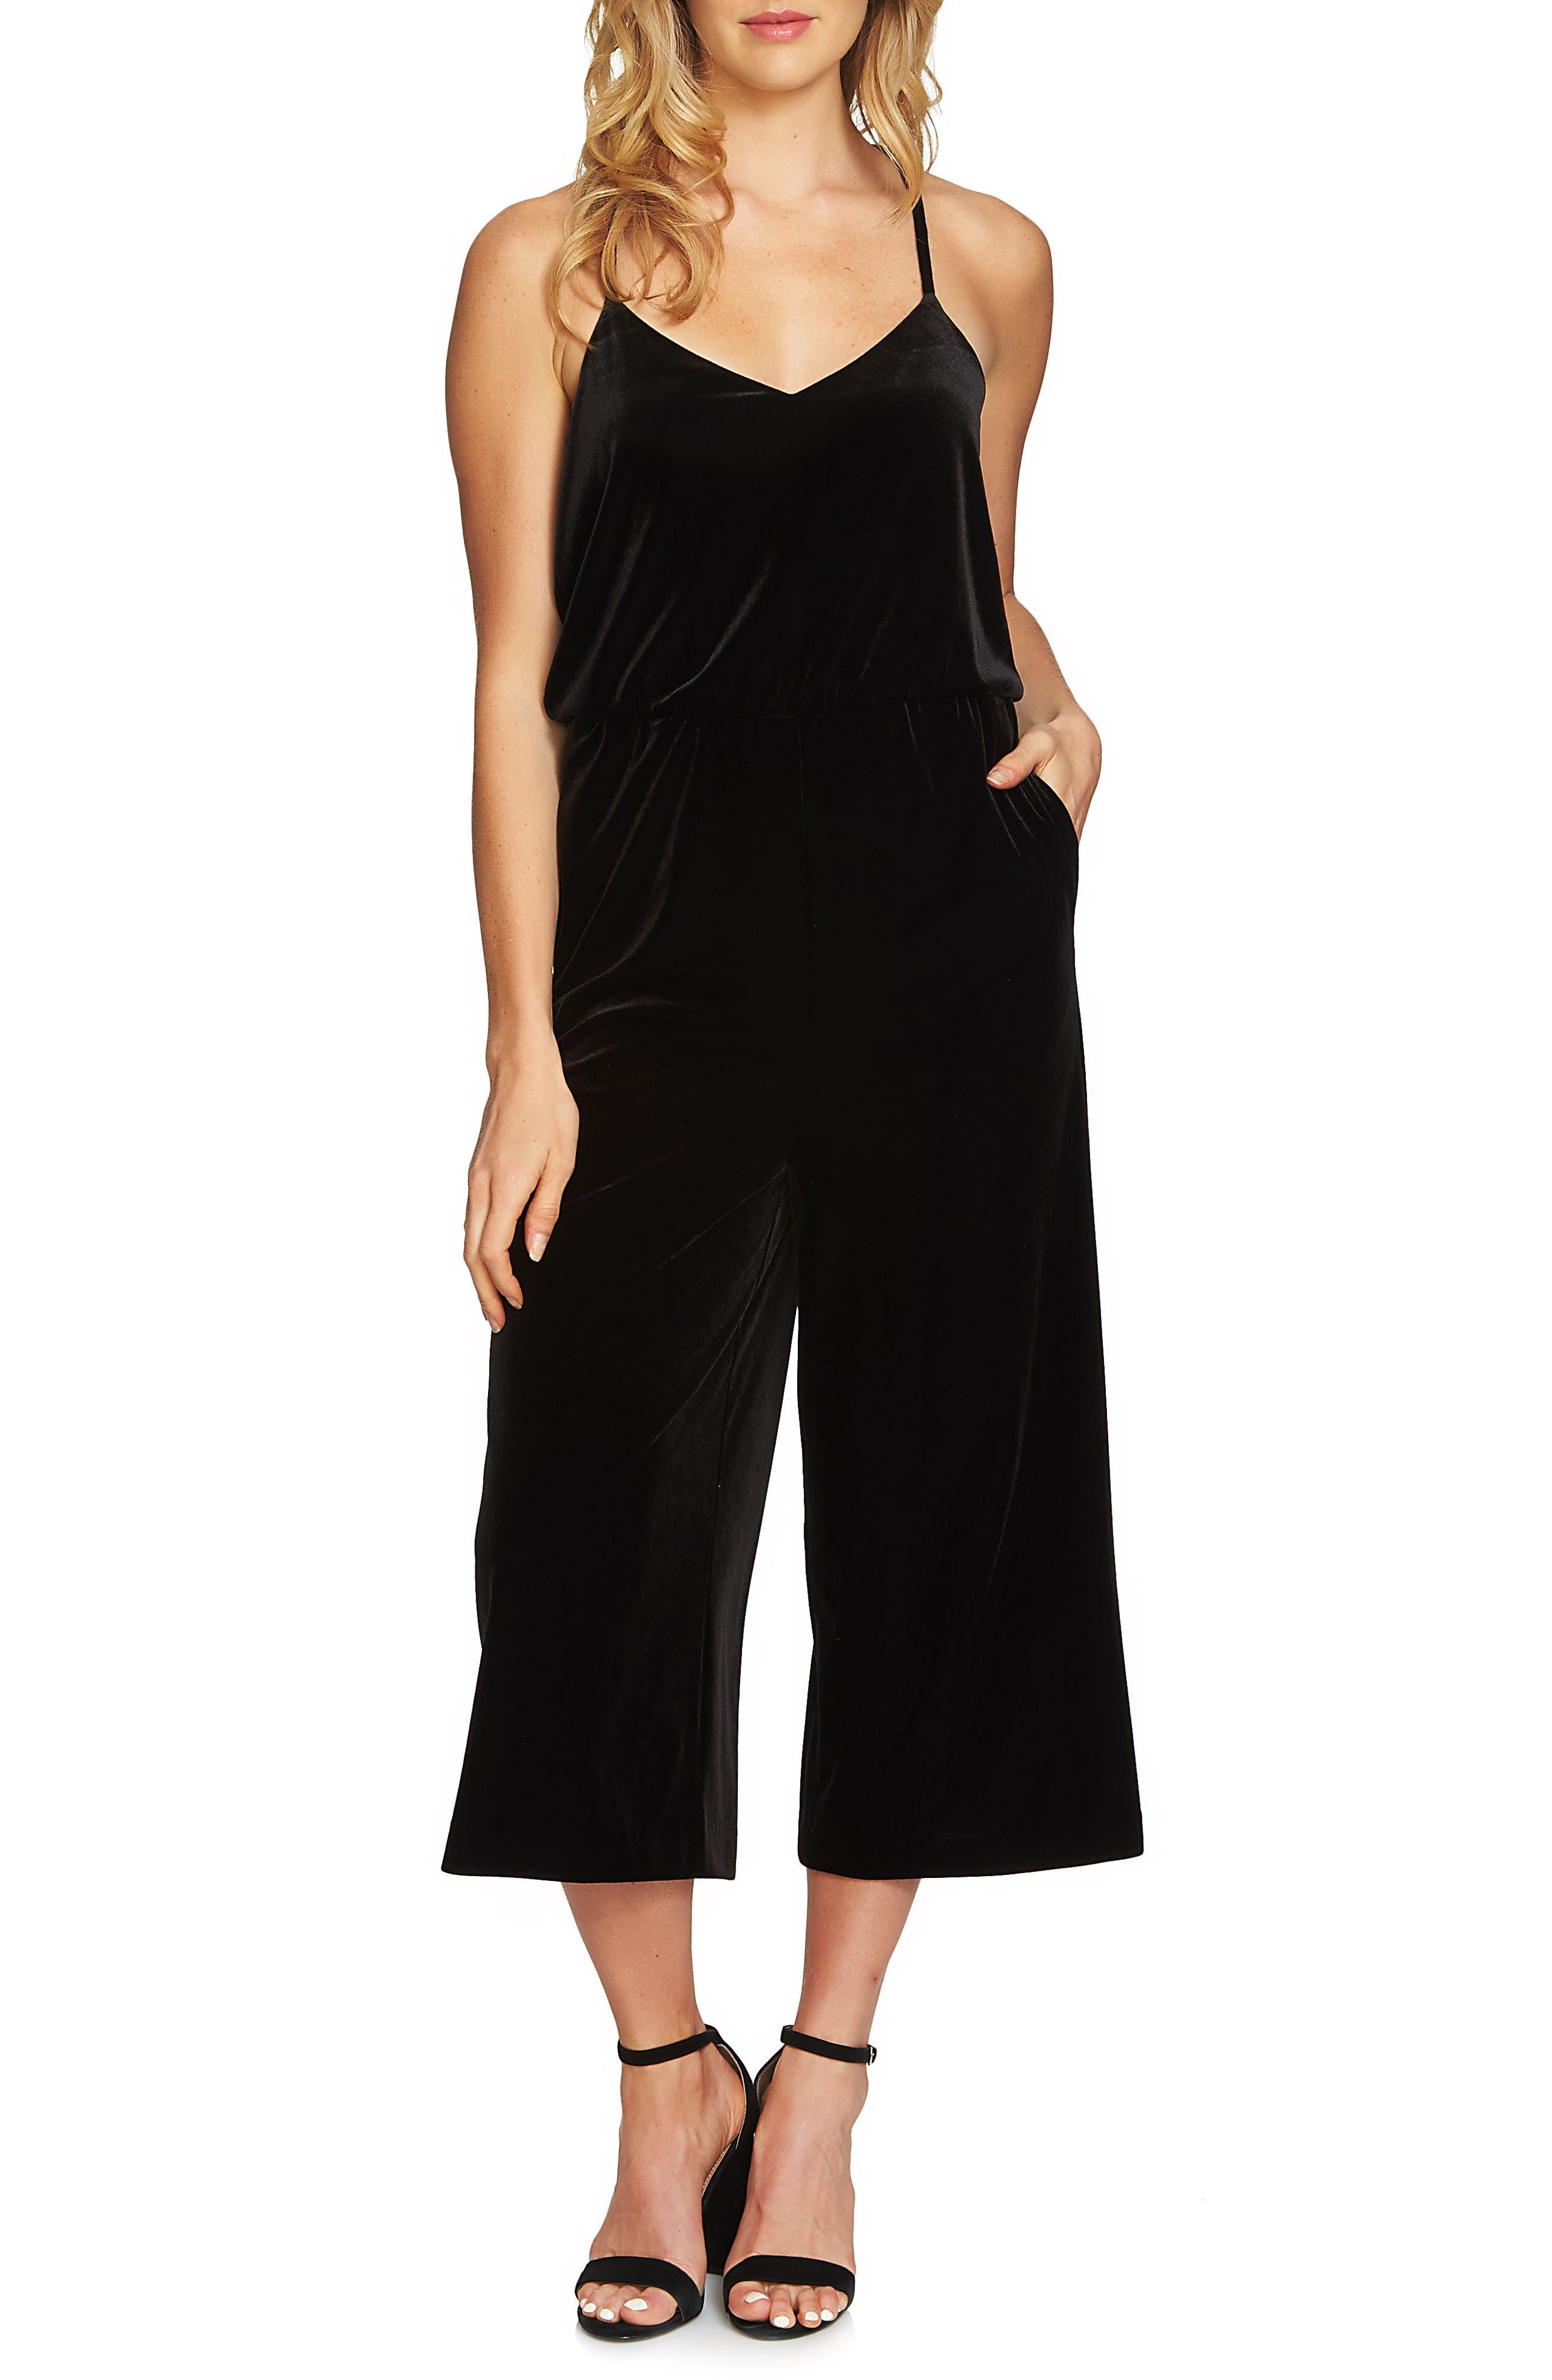 Main Image - 1.STATE Velvet Culotte Jumpsuit